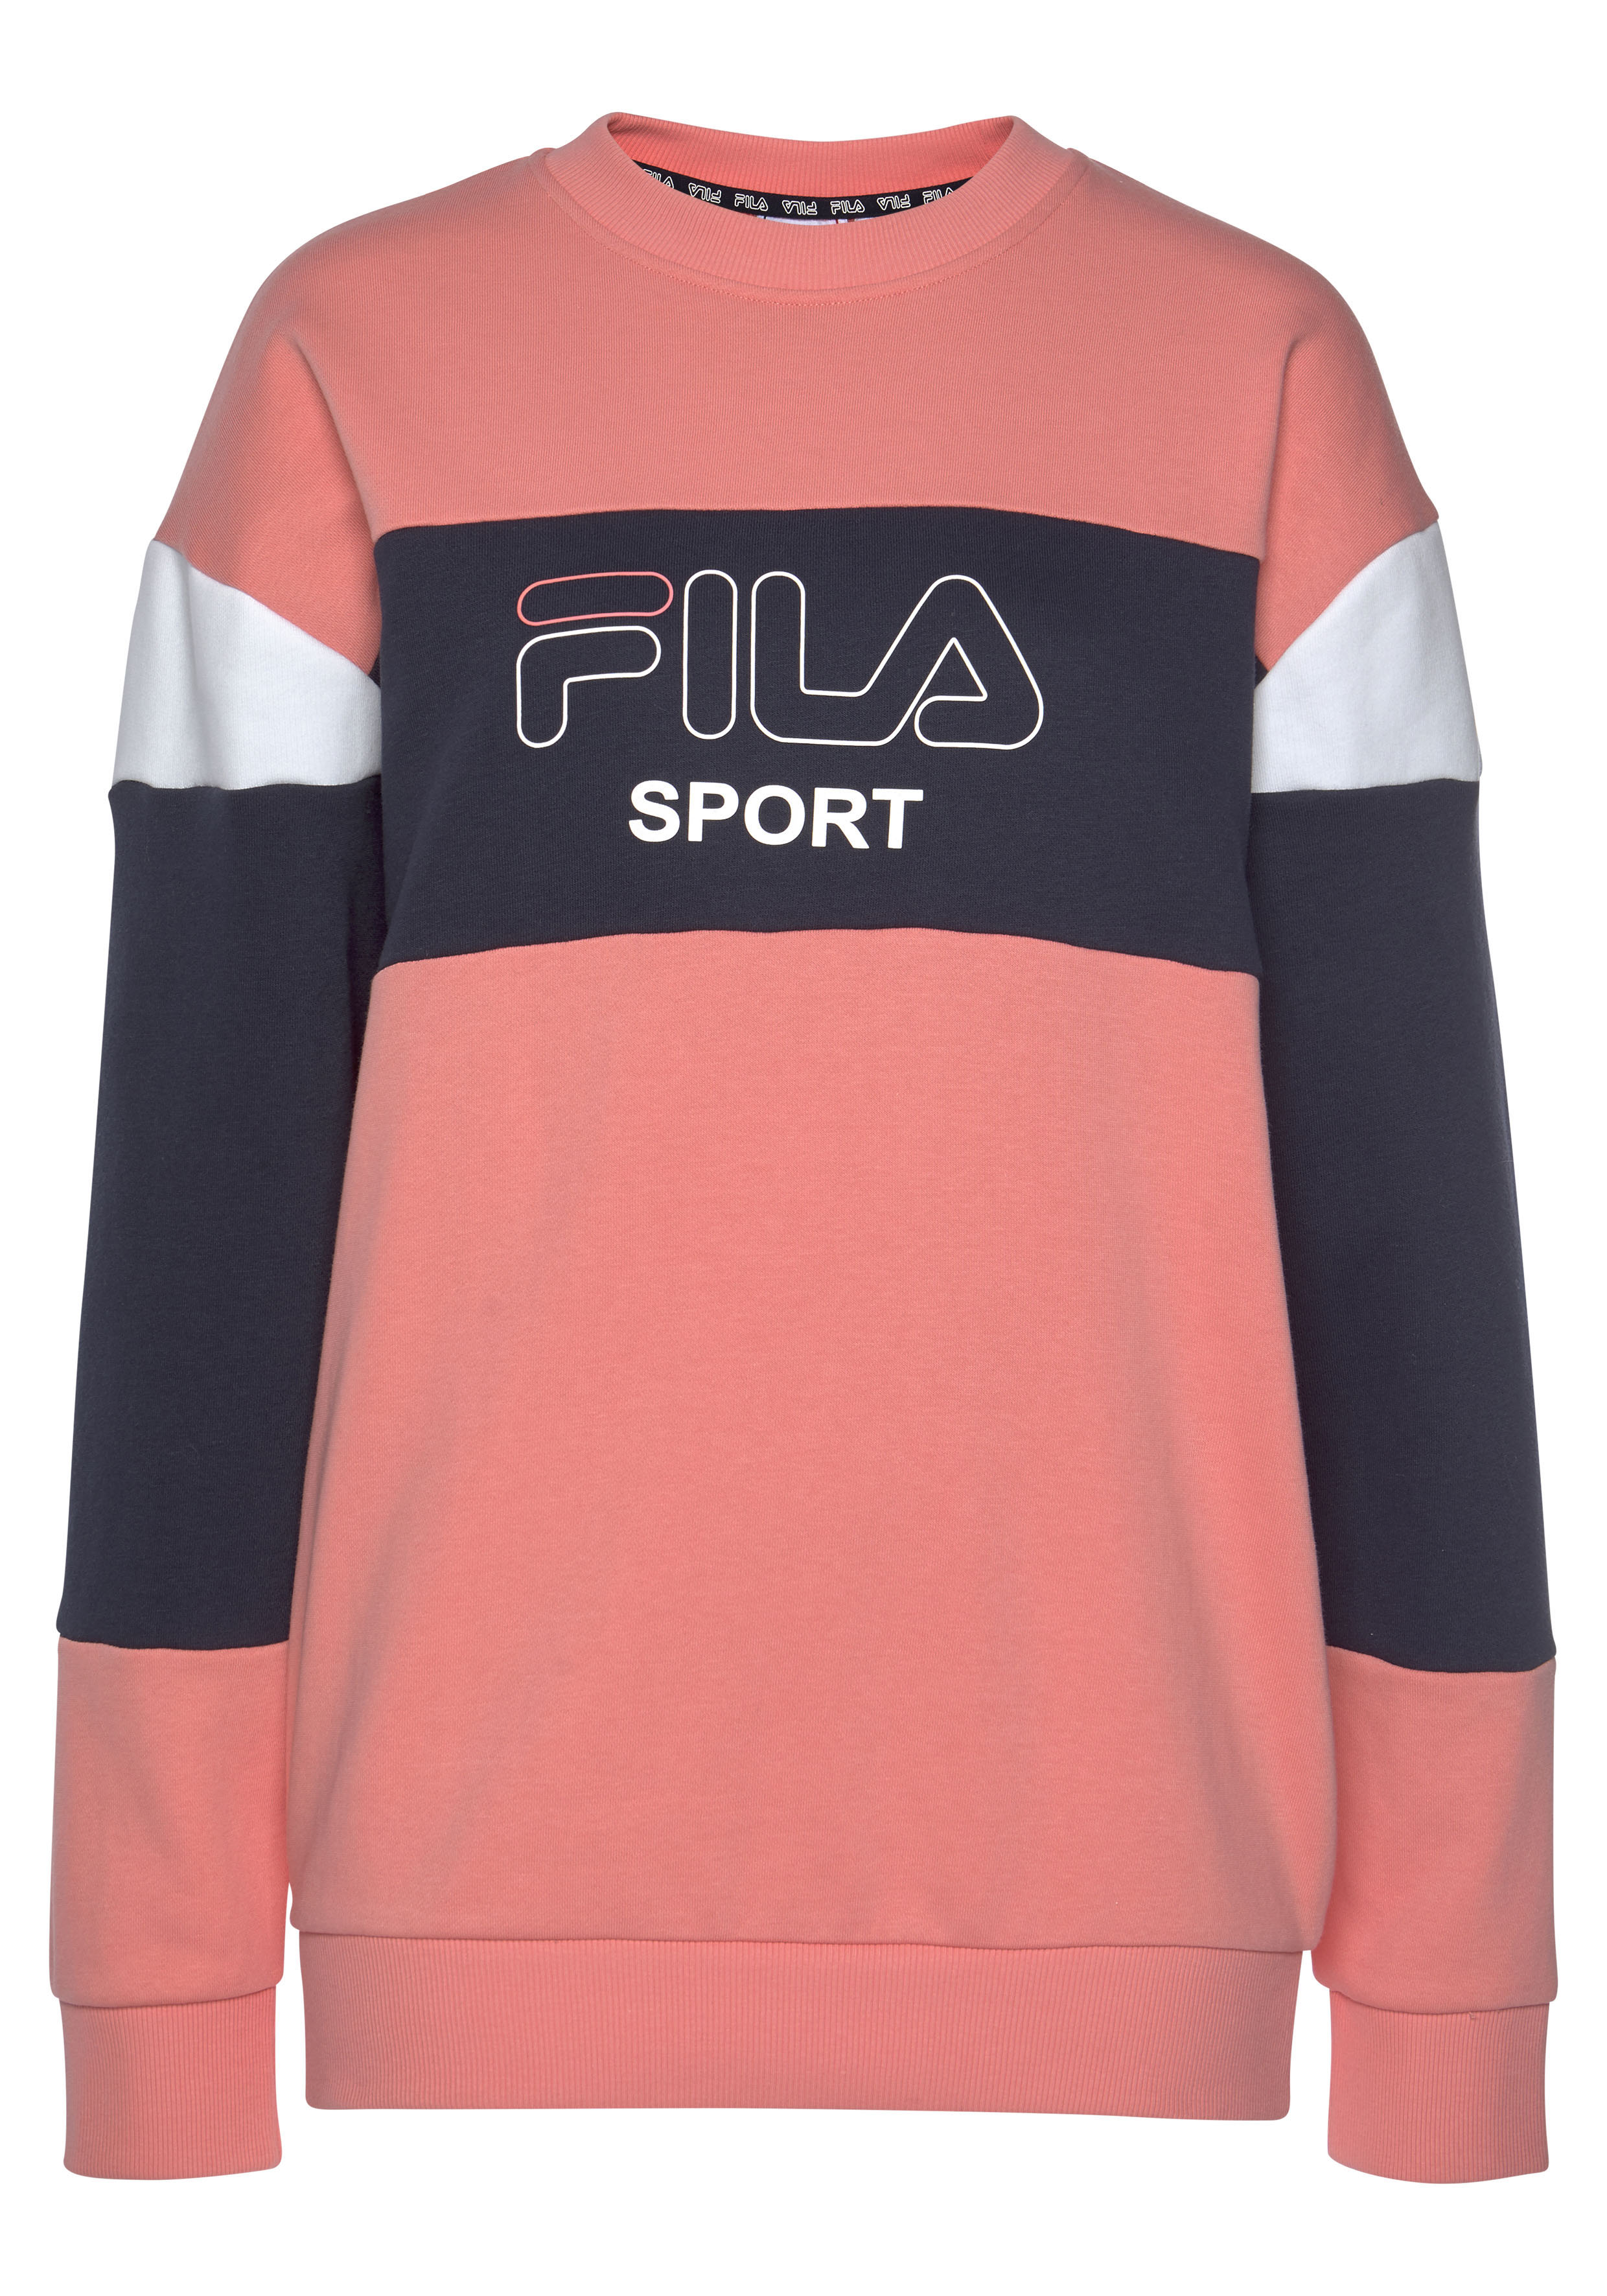 Fila Sweatshirt LANA crew sweat rosa Damen Sweatshirts Shirts